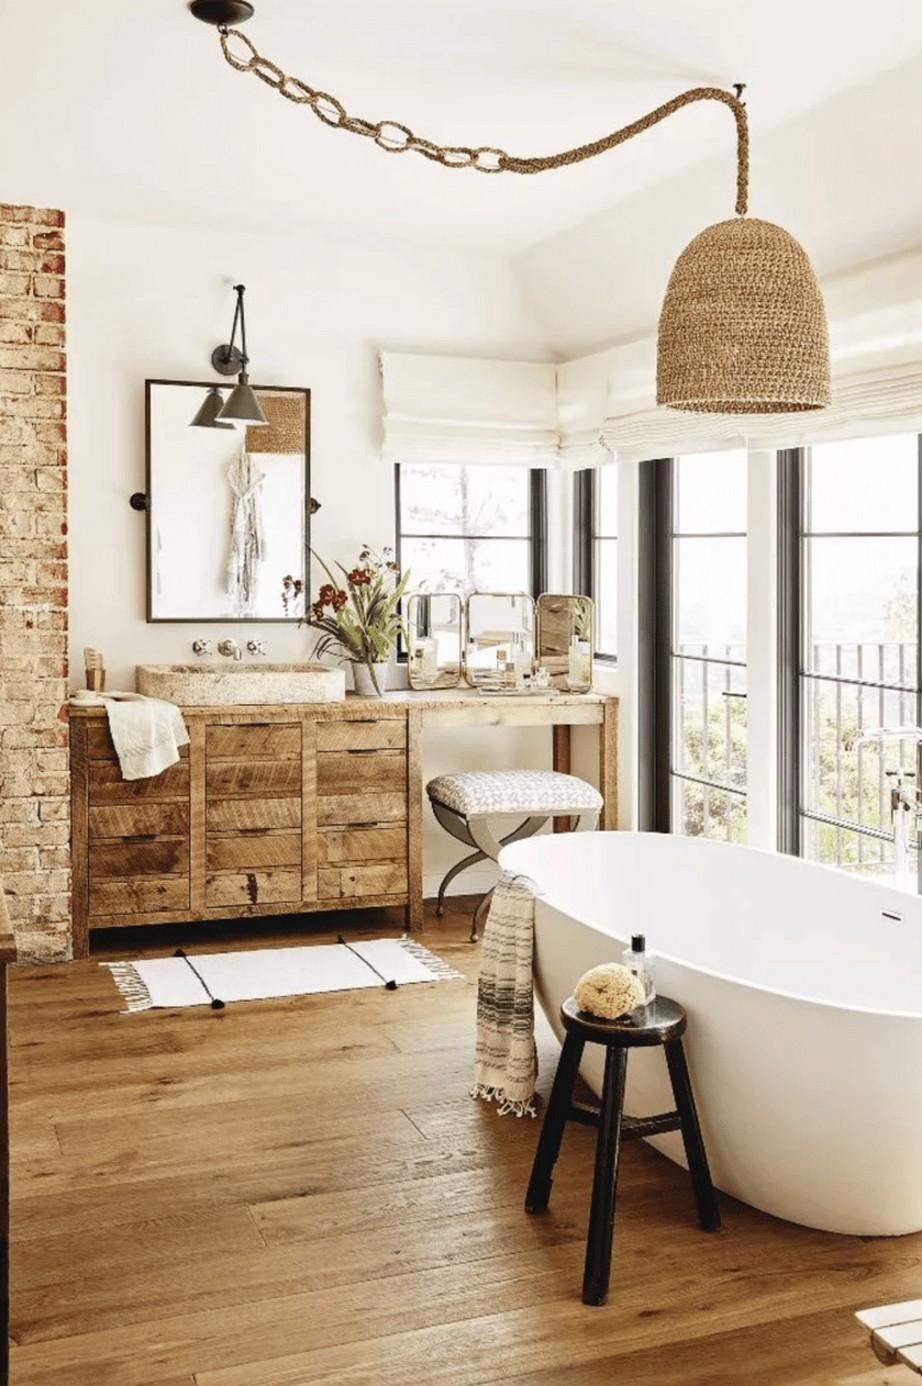 83 Modern Bathroom Design Some Tips Home Decor 52